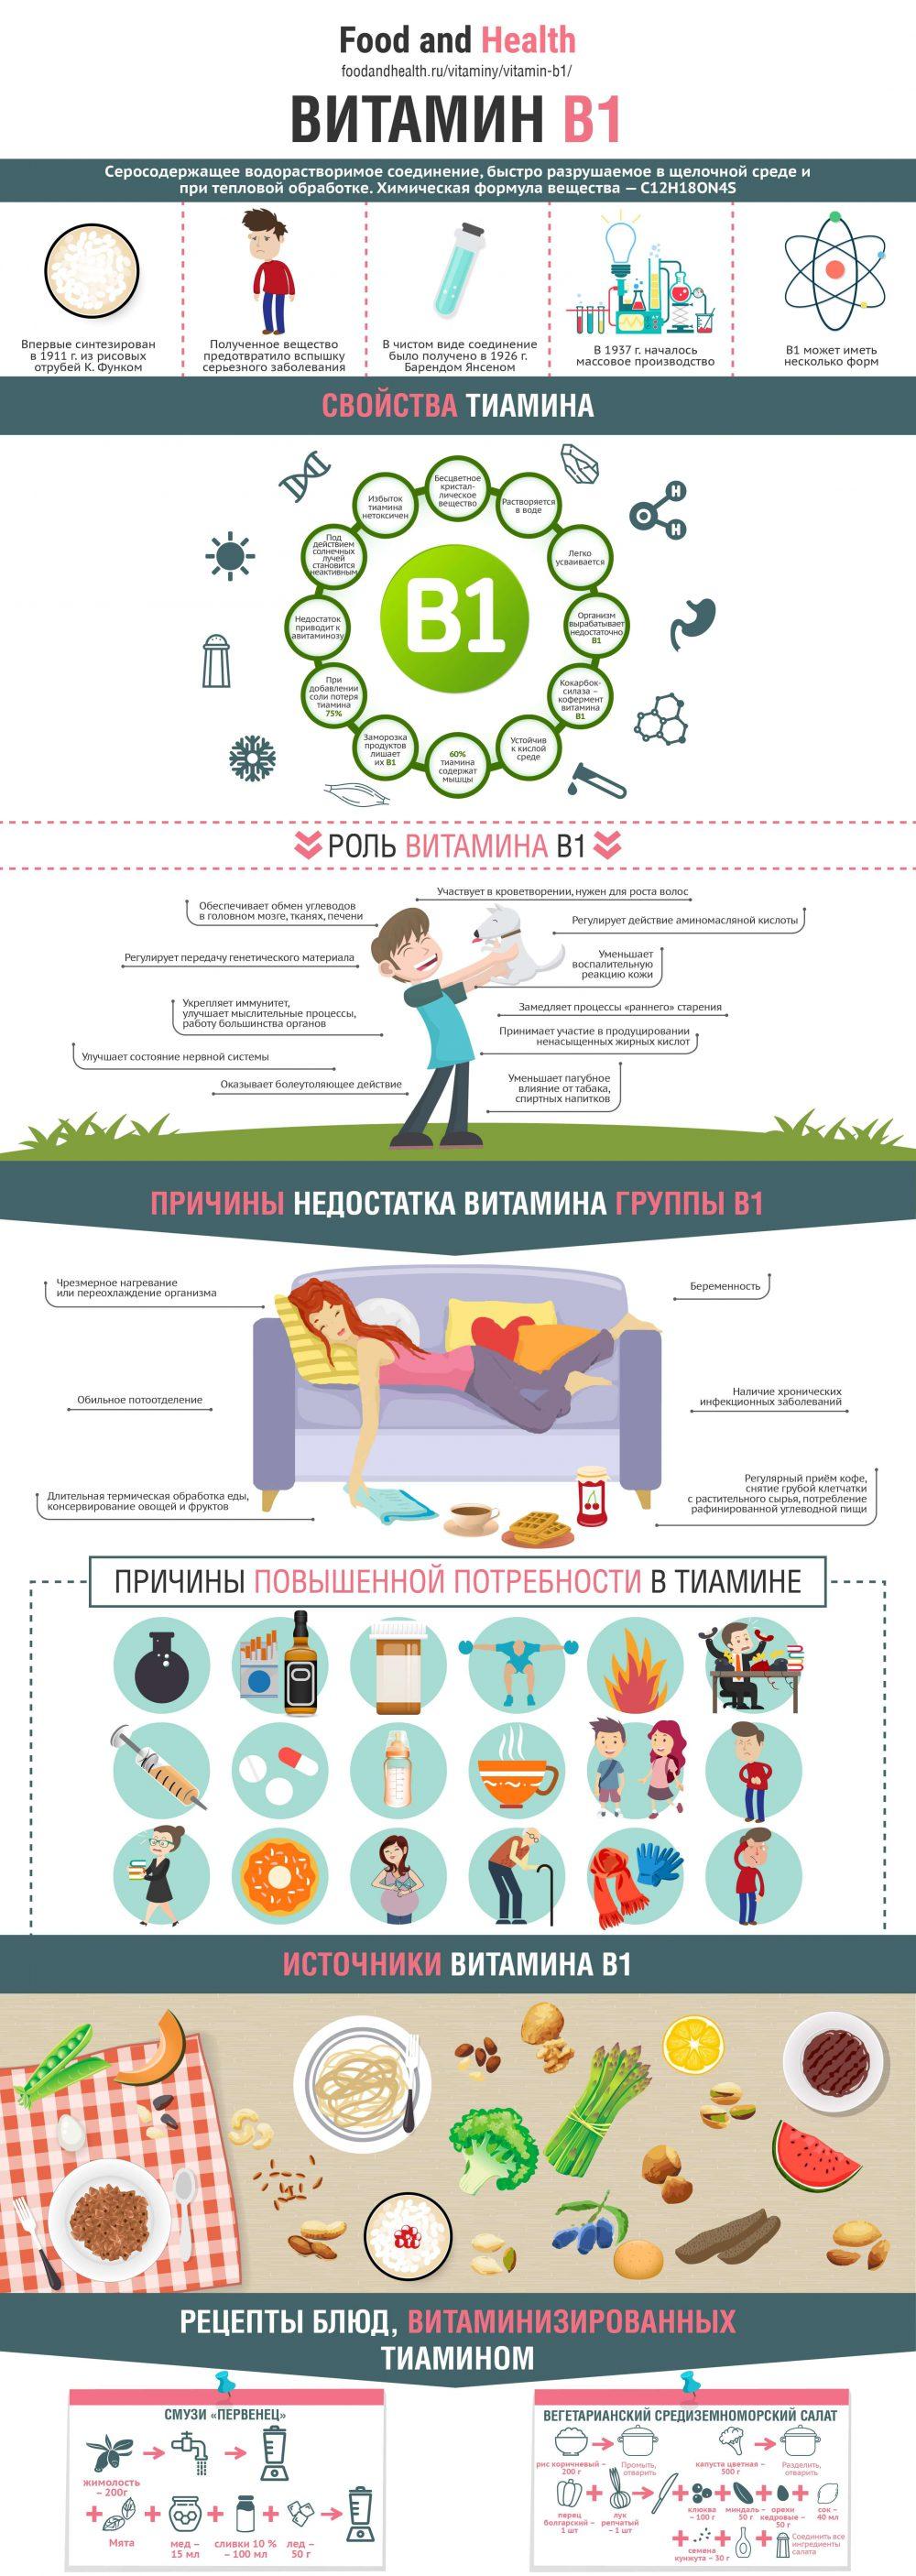 Витамин B1 - инфографика